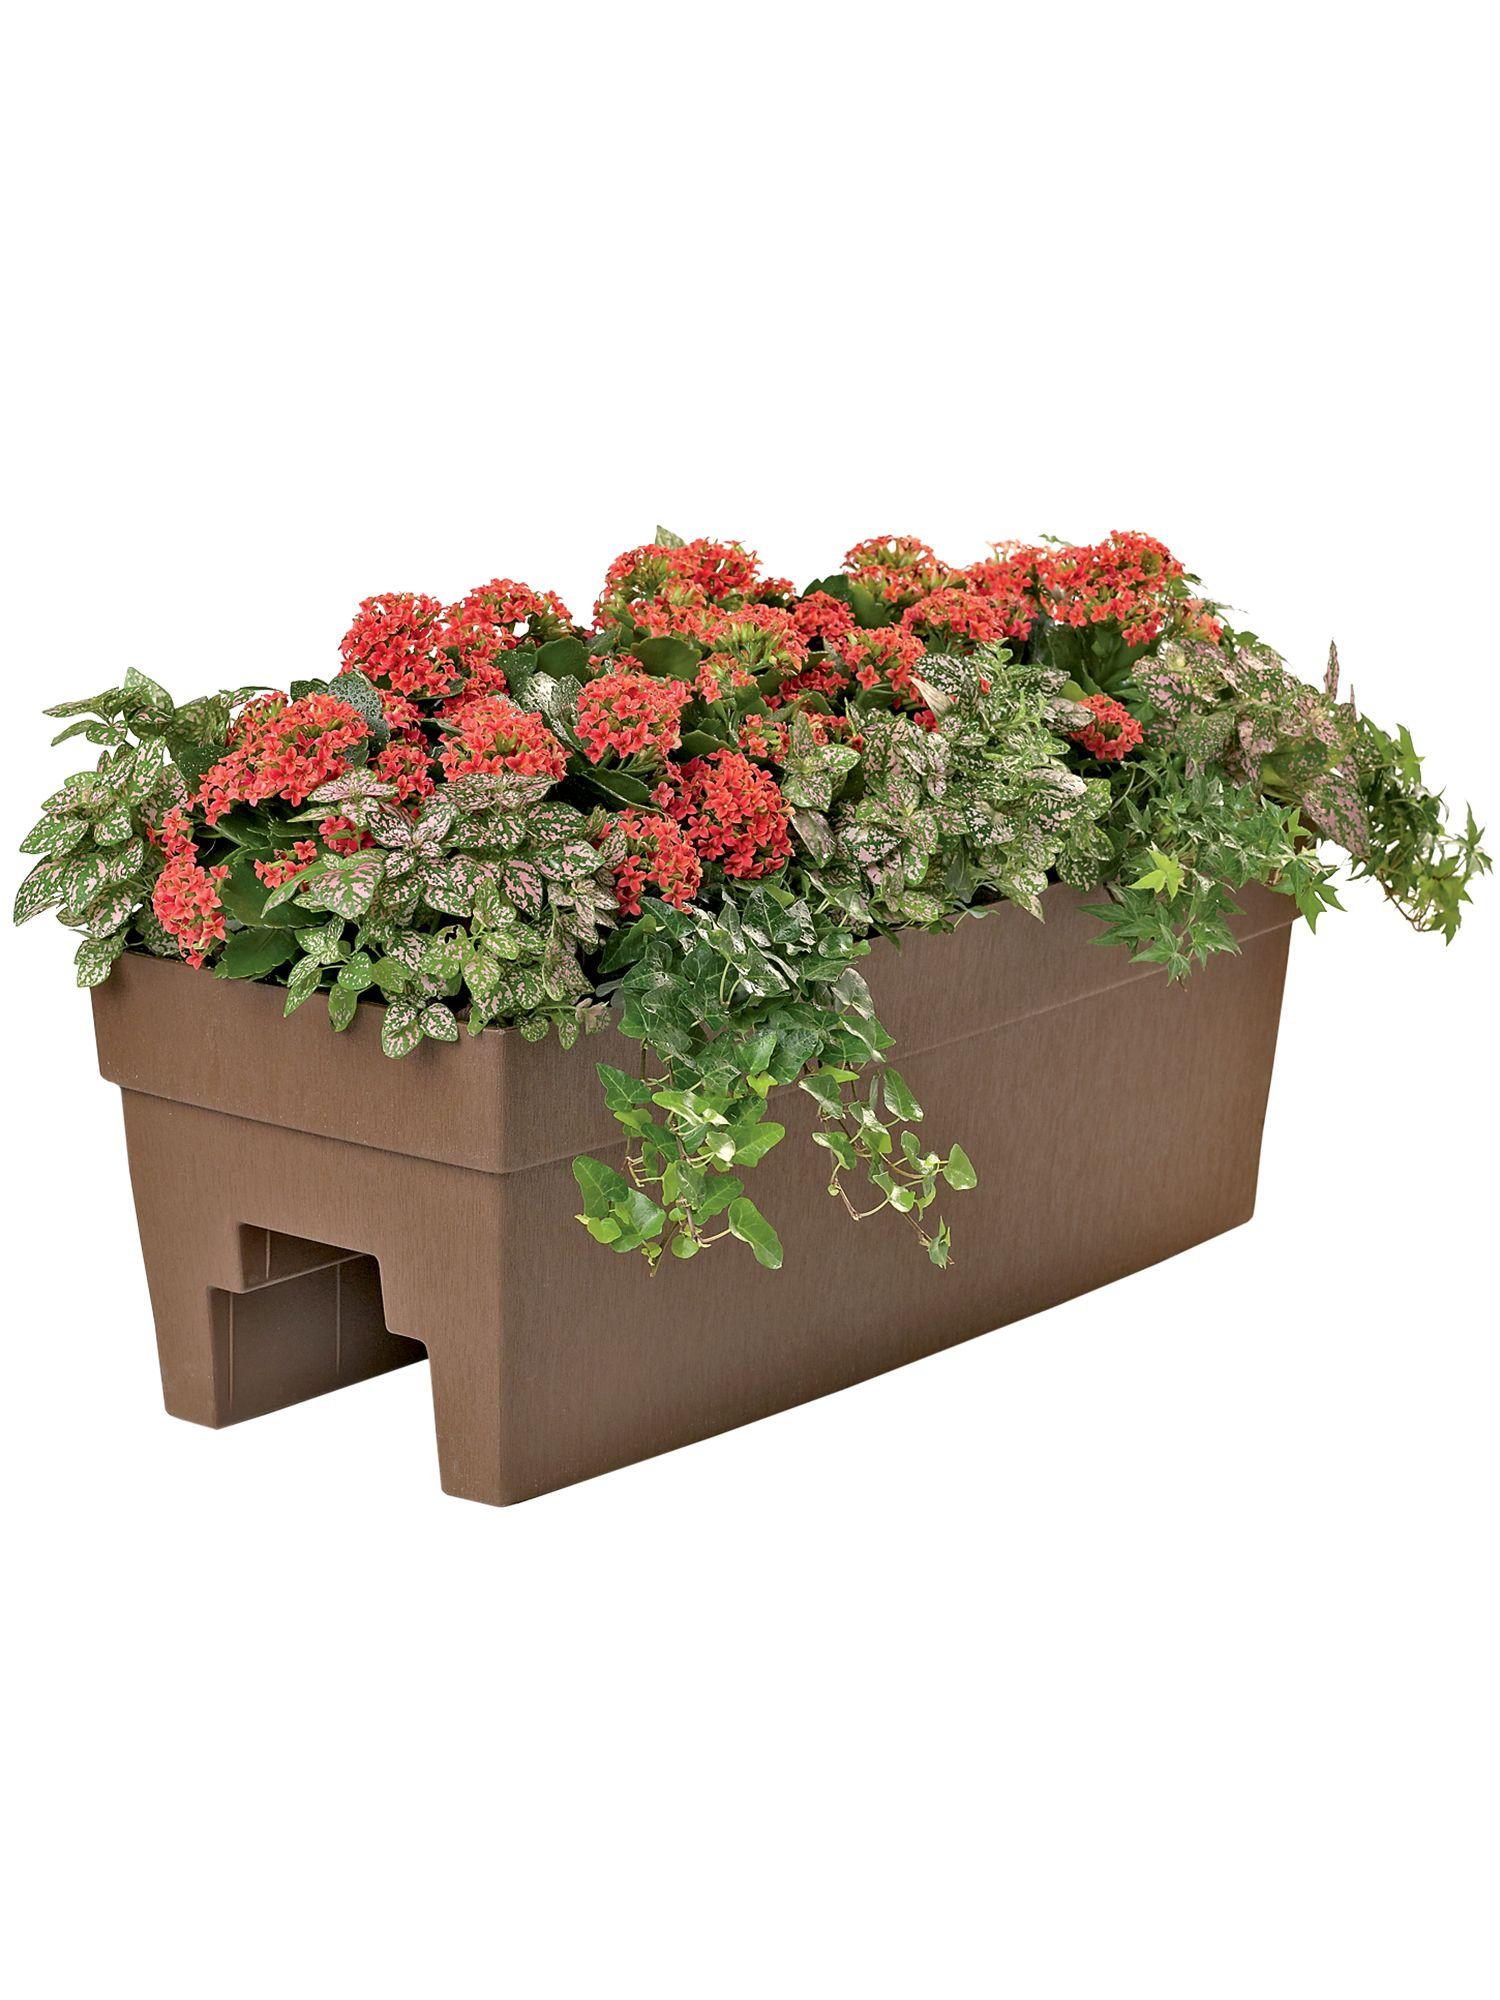 Deck Planter For 2x4 Or 2x6 Railings Gardener S Supply